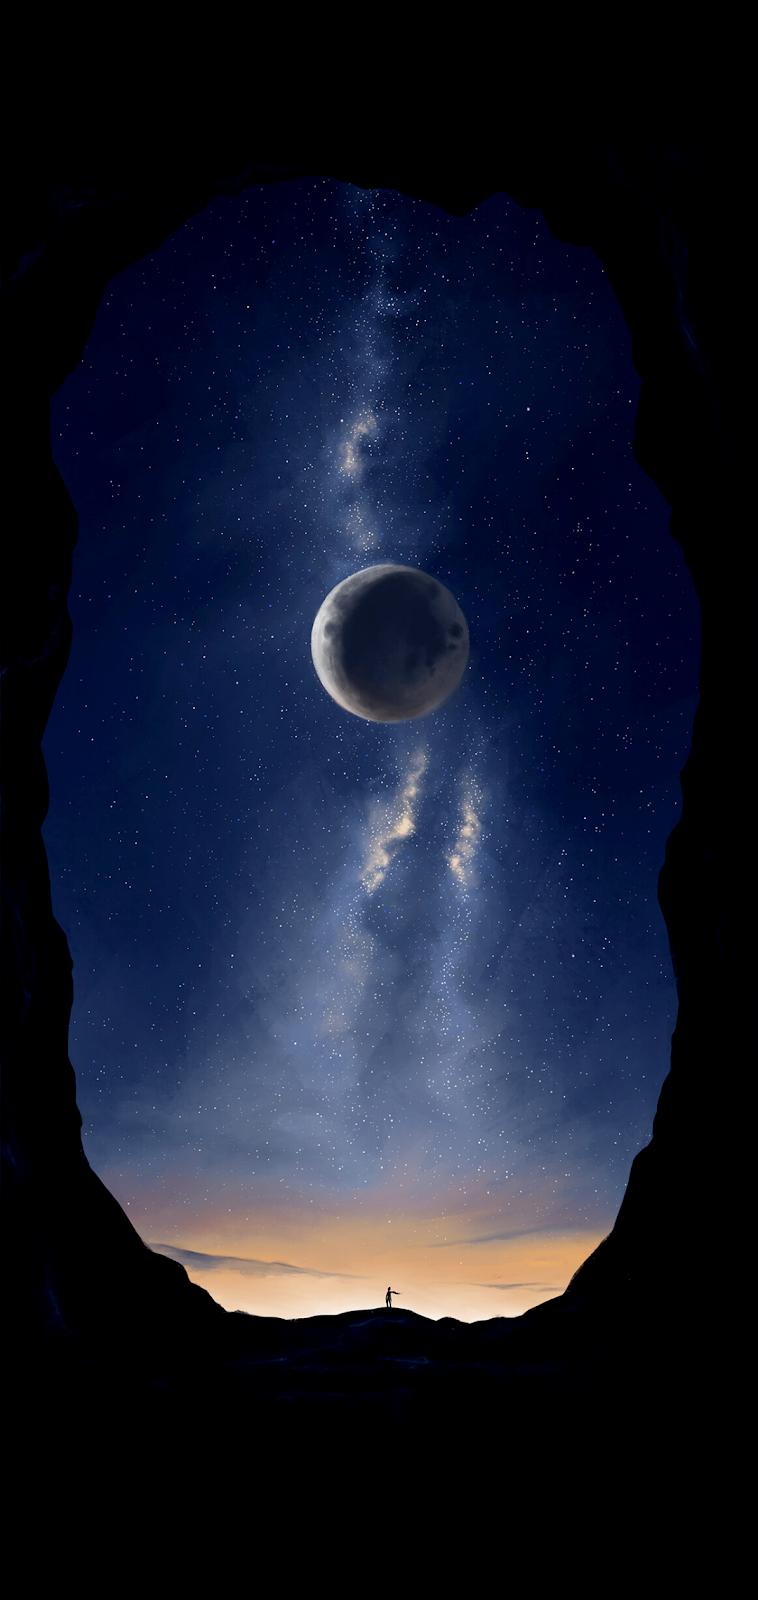 Bigger Than Us Wallpaper Iphone Android Background Followme Trippy Wallpaper Wallpaper Reflection Art